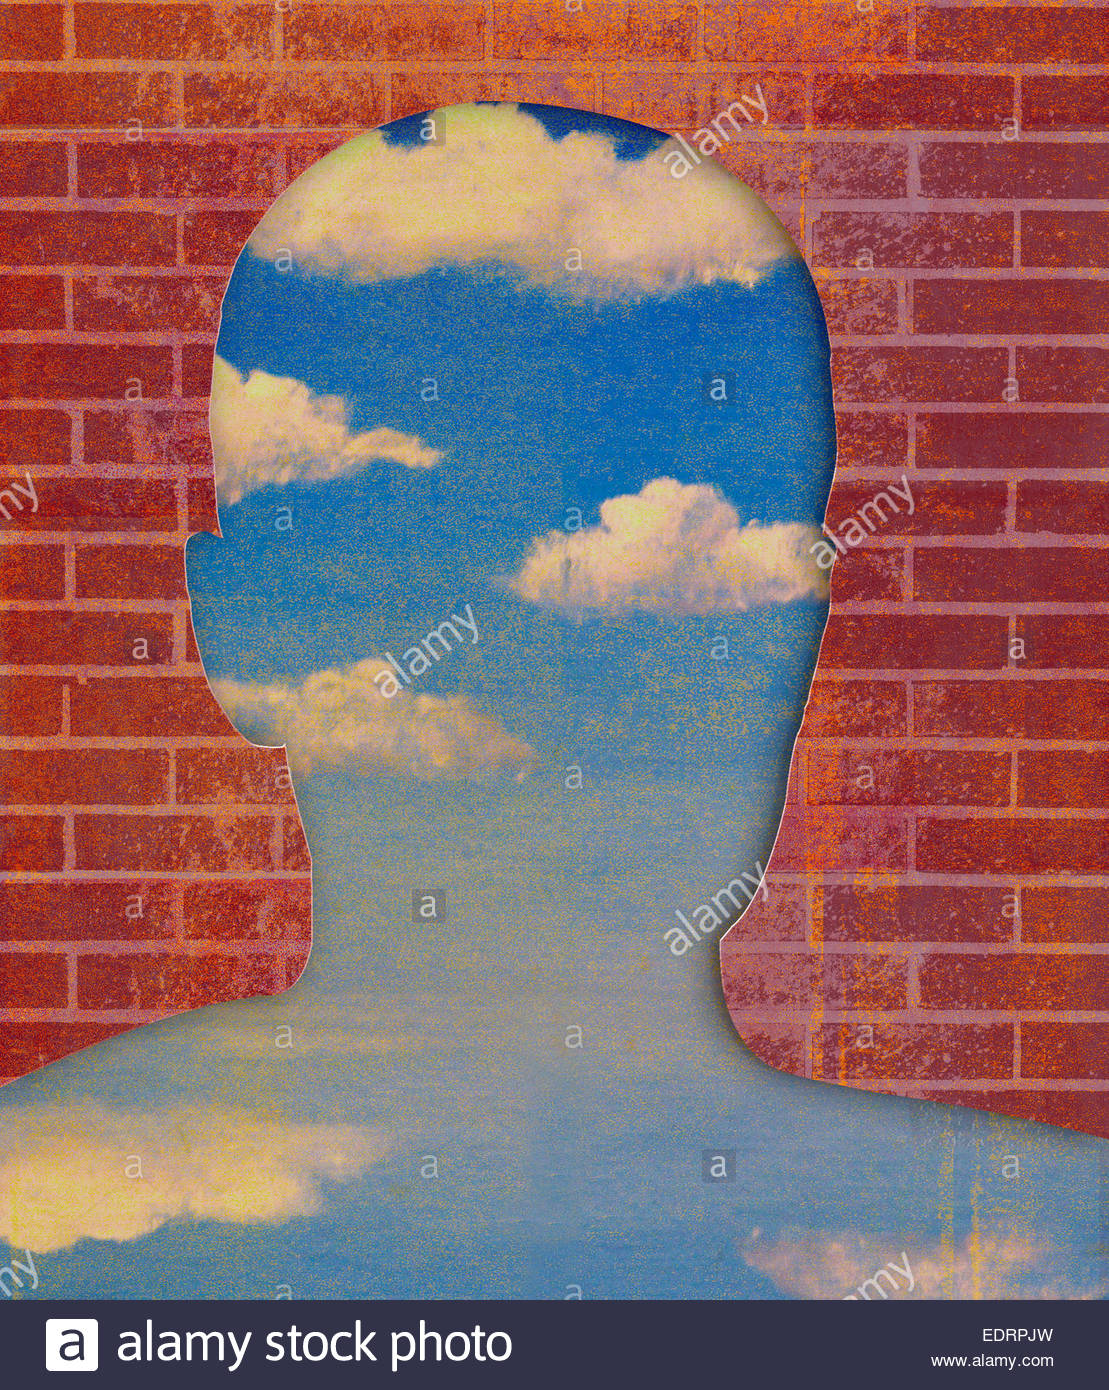 Ziegelmauer enthüllt blauen Himmel in Form des Kopfes Stockbild